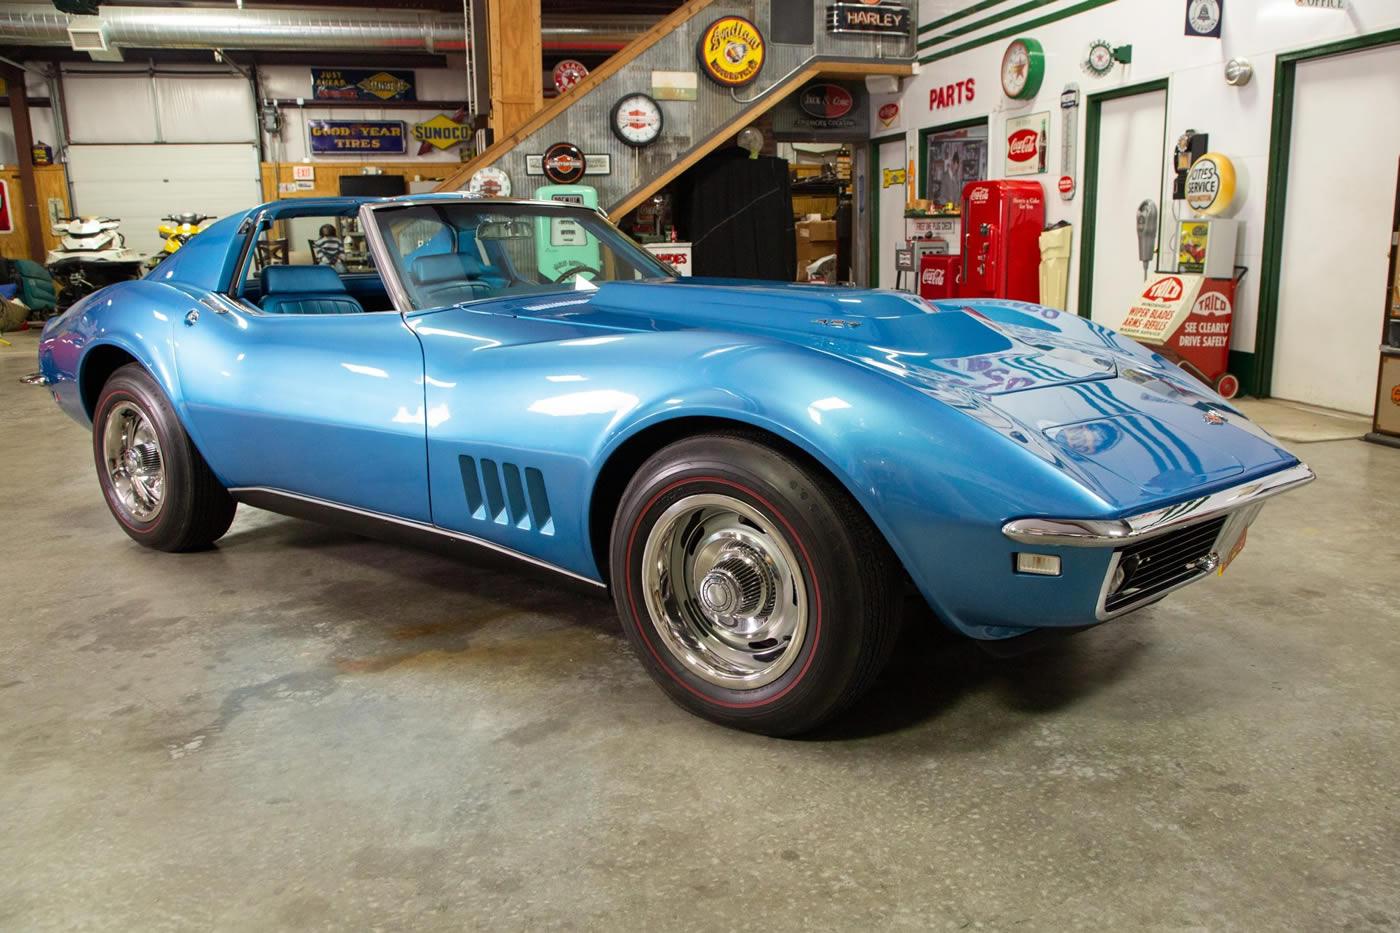 1968-corvette-l88-coupe-194378S414566-10.jpg